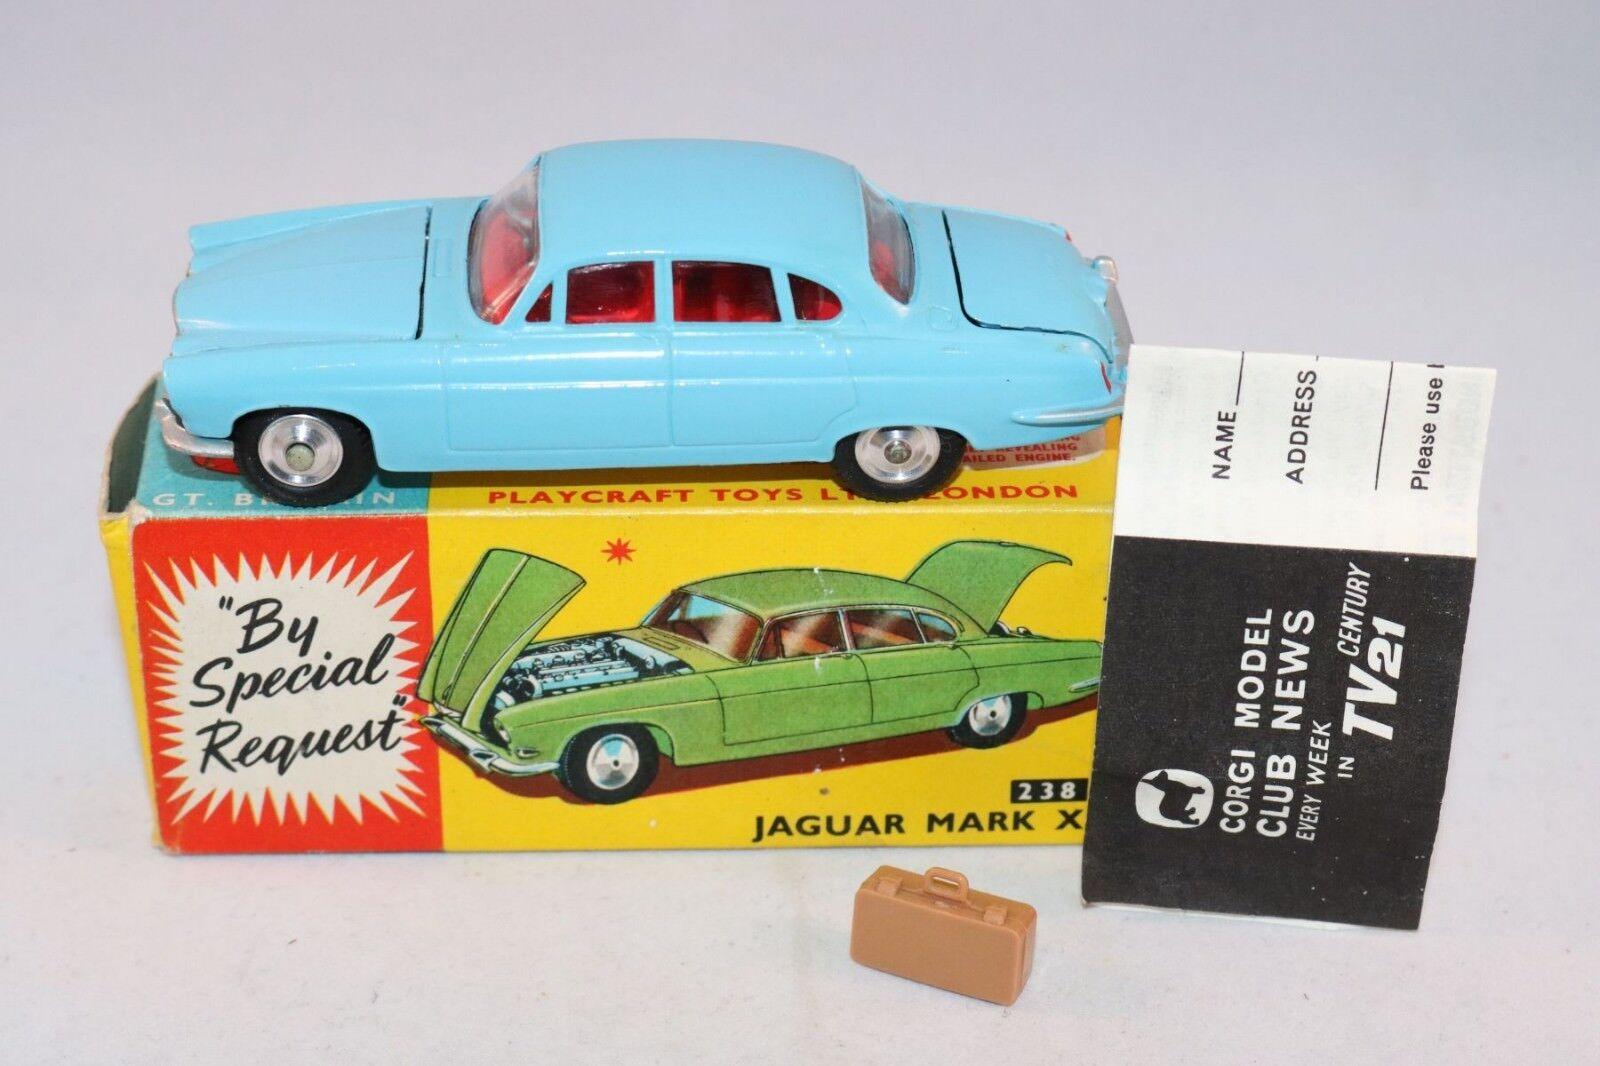 Corgi Toys 238 Jaguar Mark X blueee with spun hubs perfect mint in box & leaflat